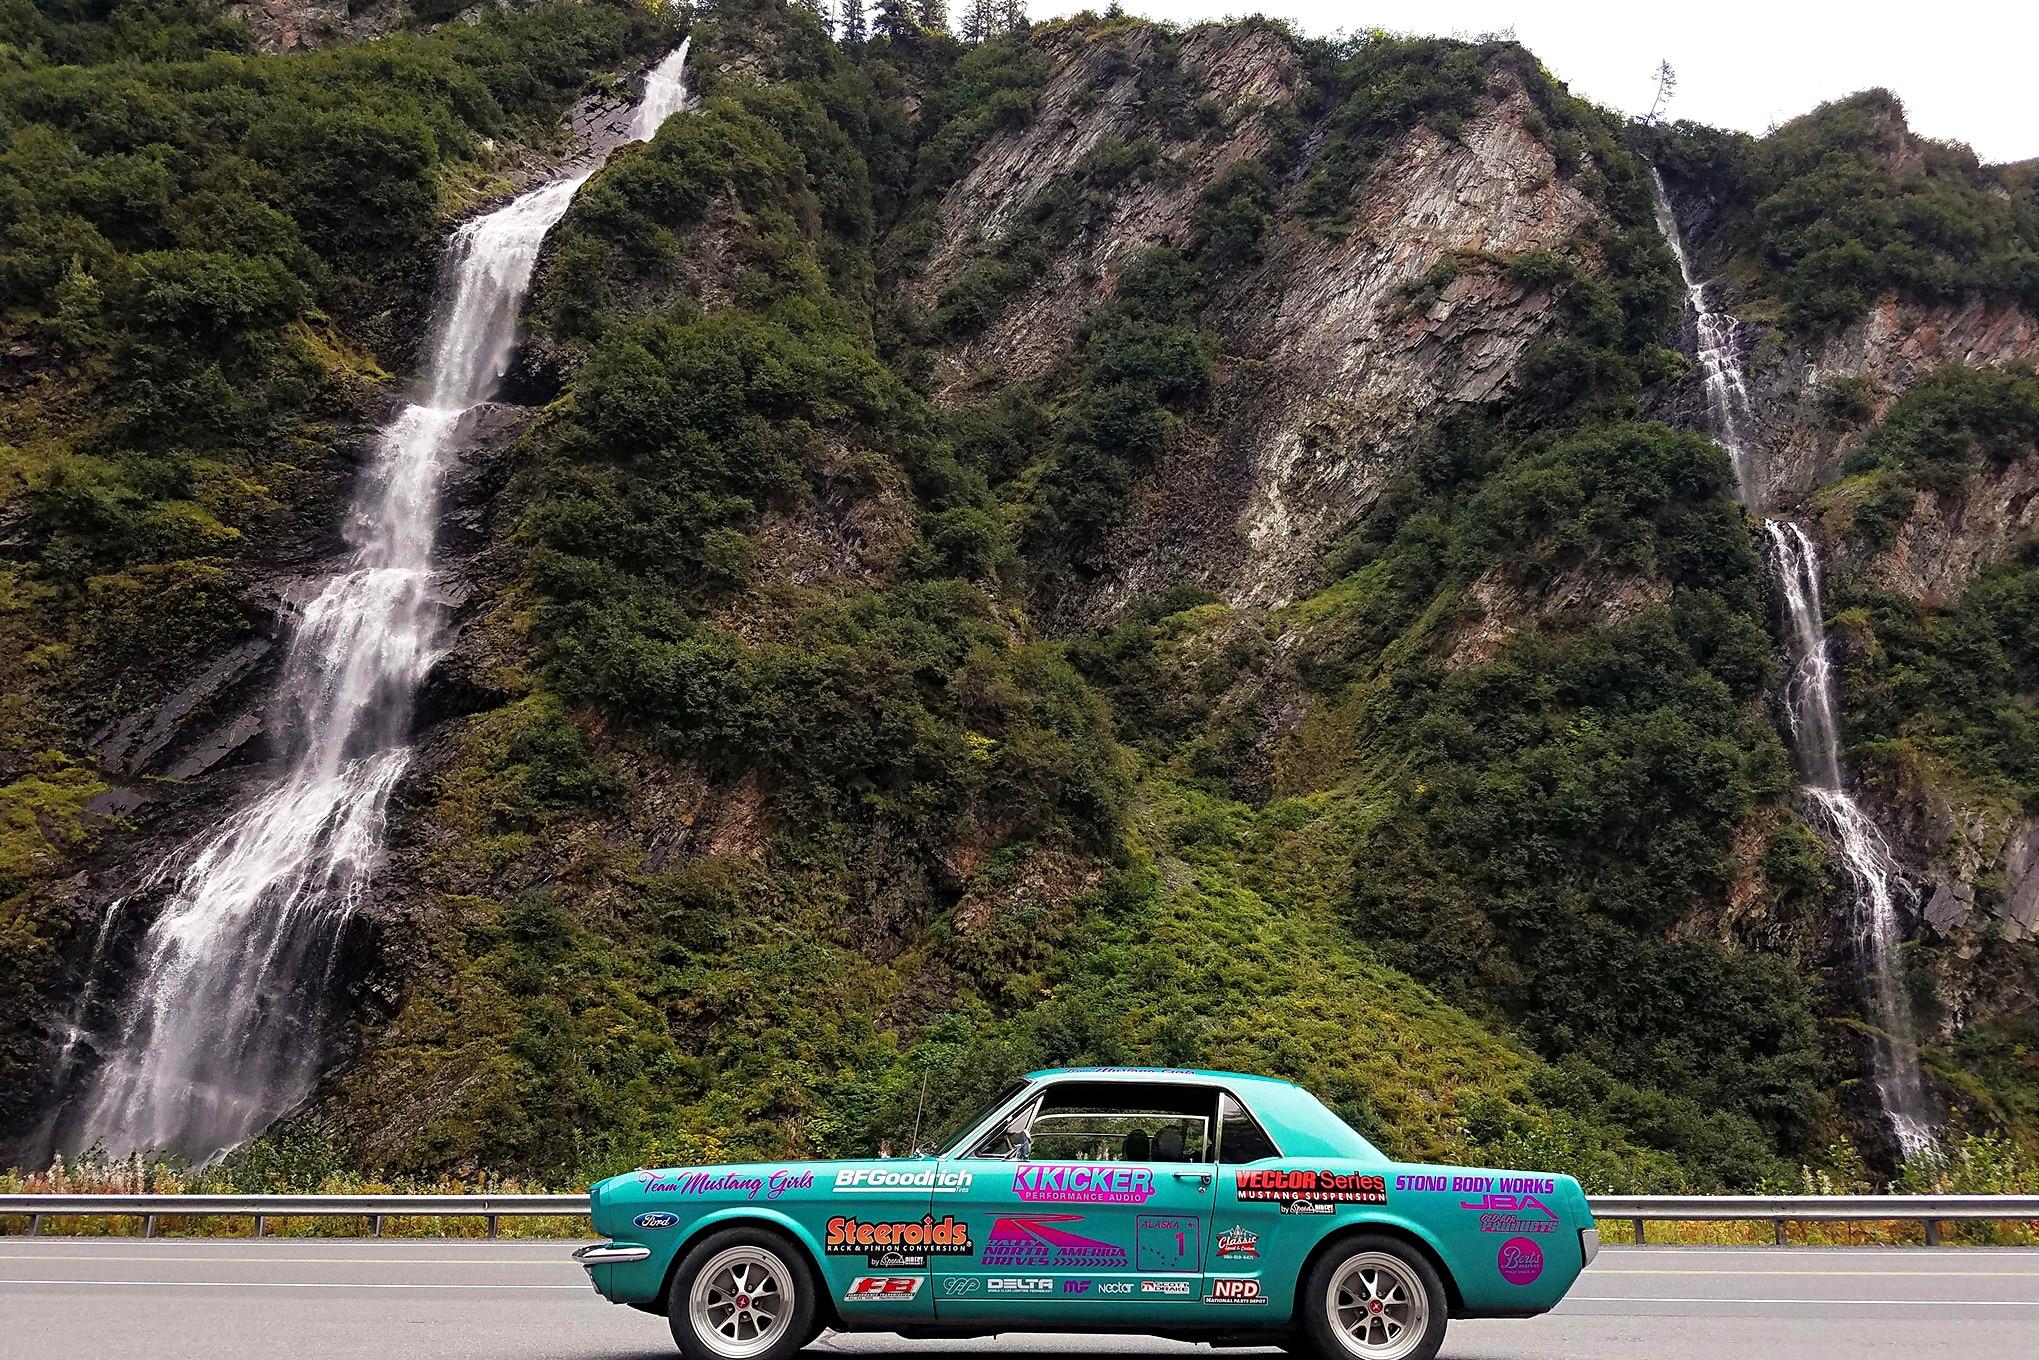 1965 Ford Mustang Alaska Roadtrip Adventure 03